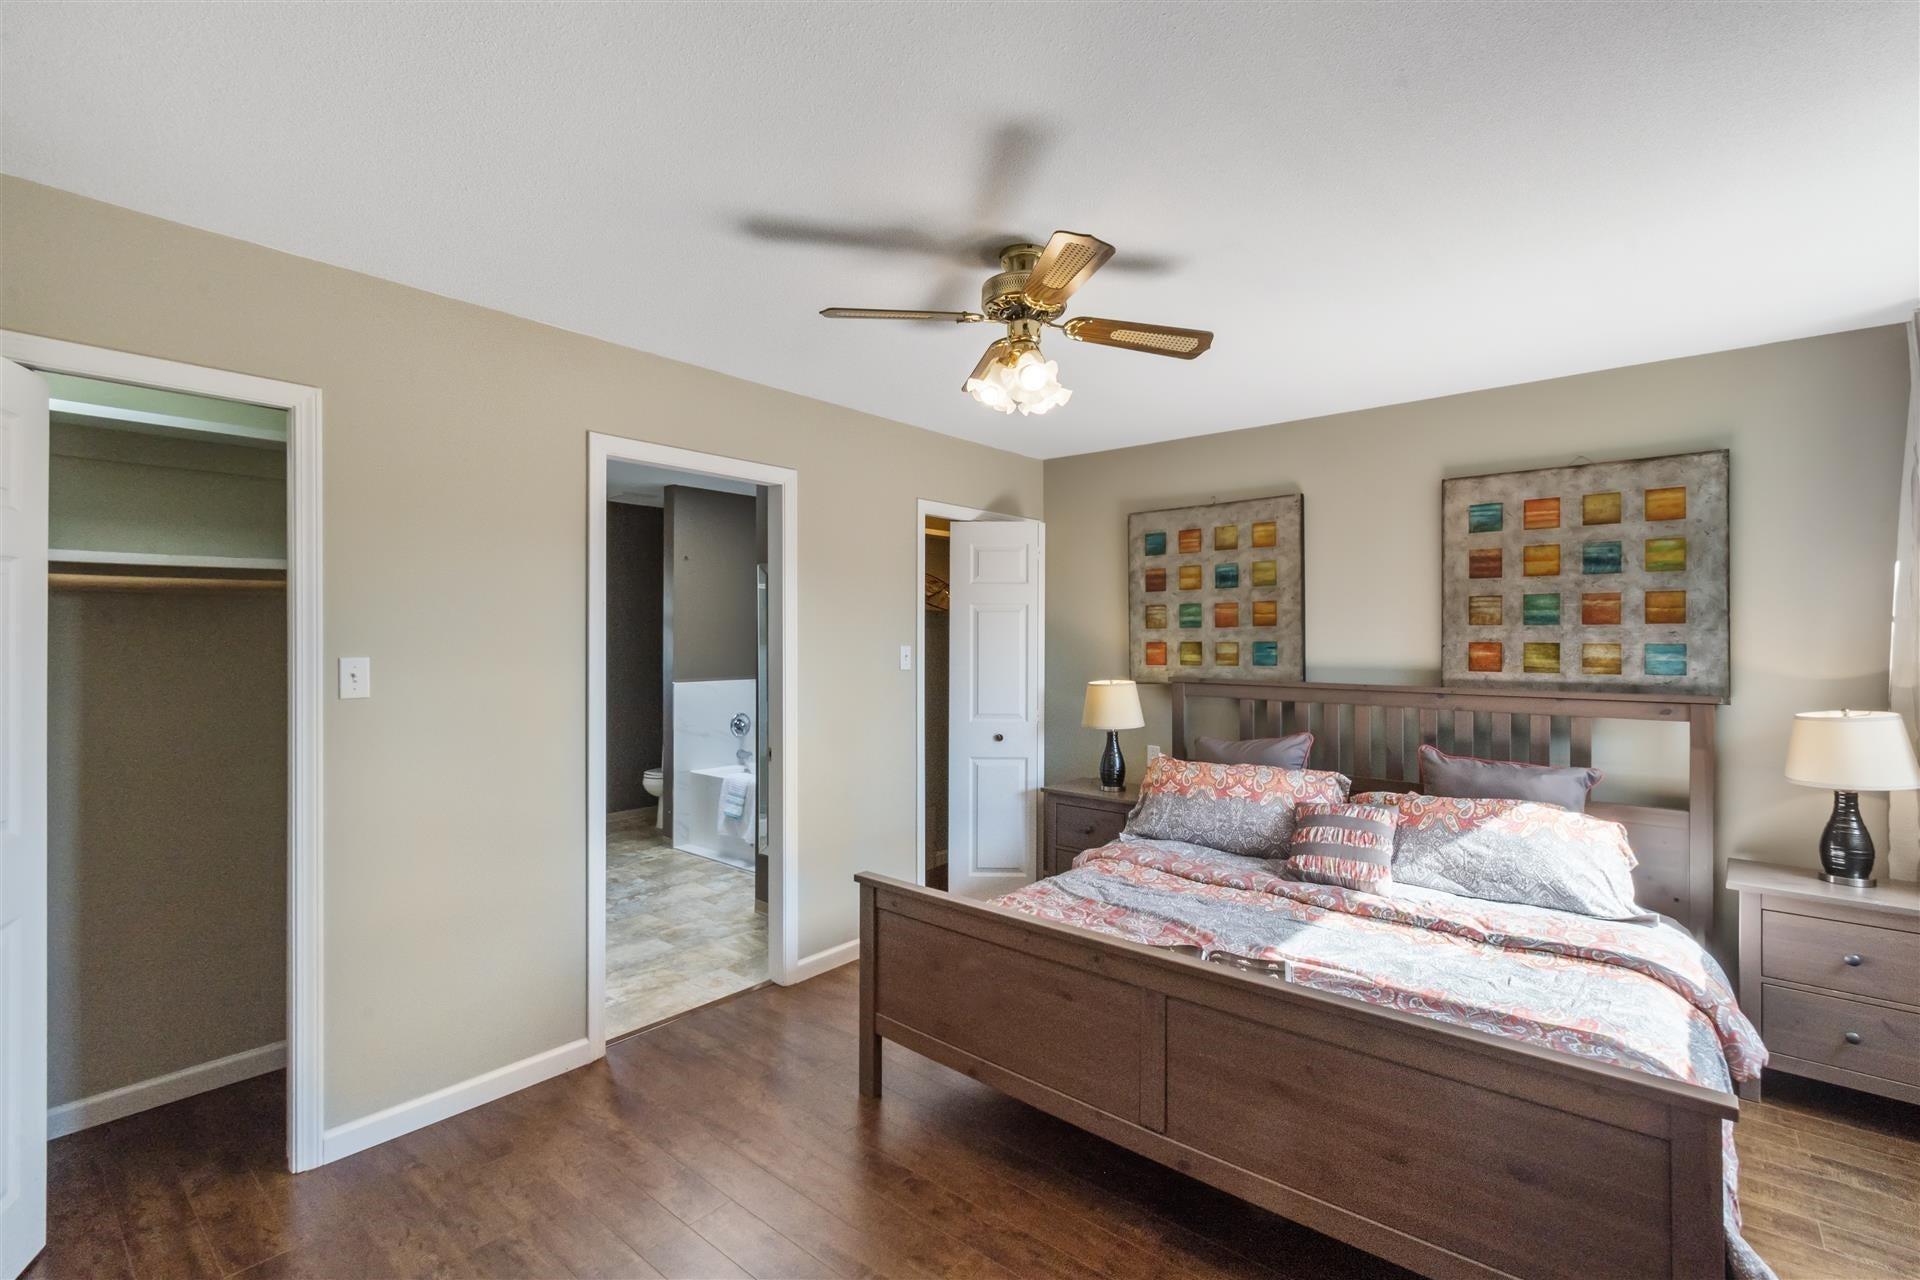 3631 GEORGIA STREET - Steveston Village House/Single Family for sale, 3 Bedrooms (R2623894) - #11